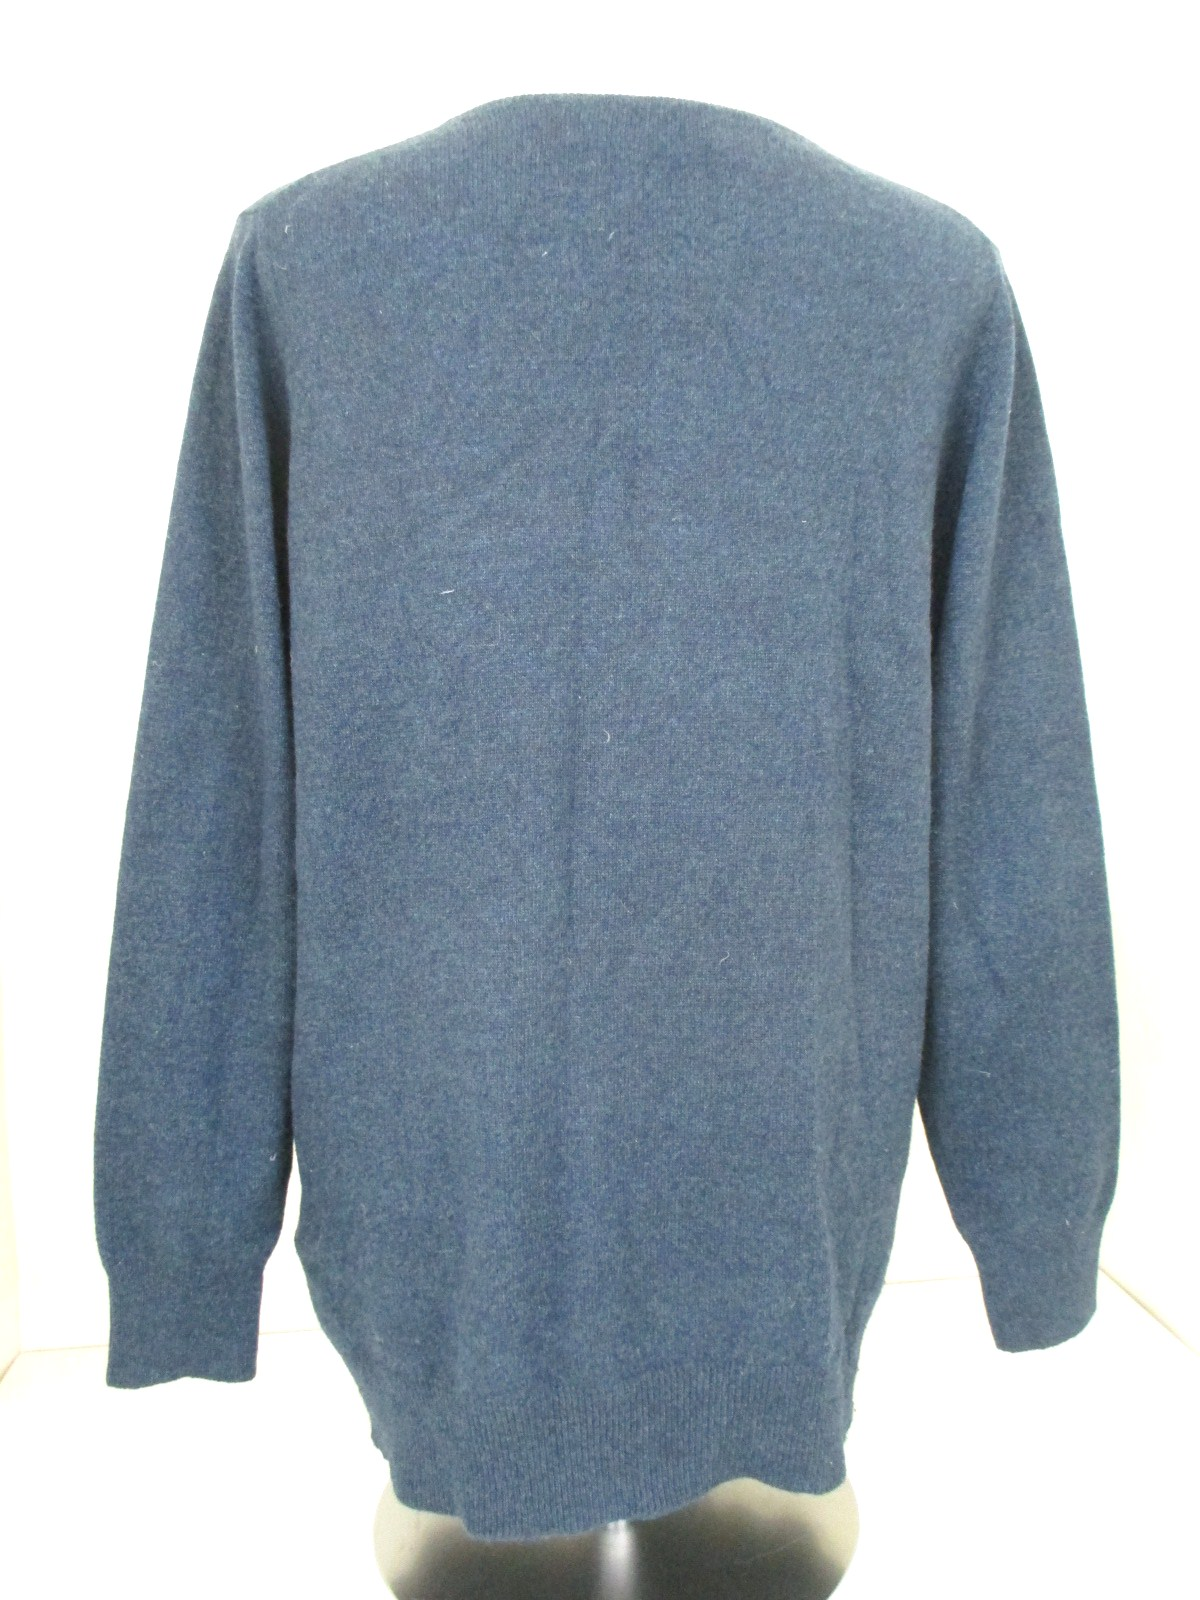 DEUXIEME CLASSE(ドゥーズィエム)のセーター